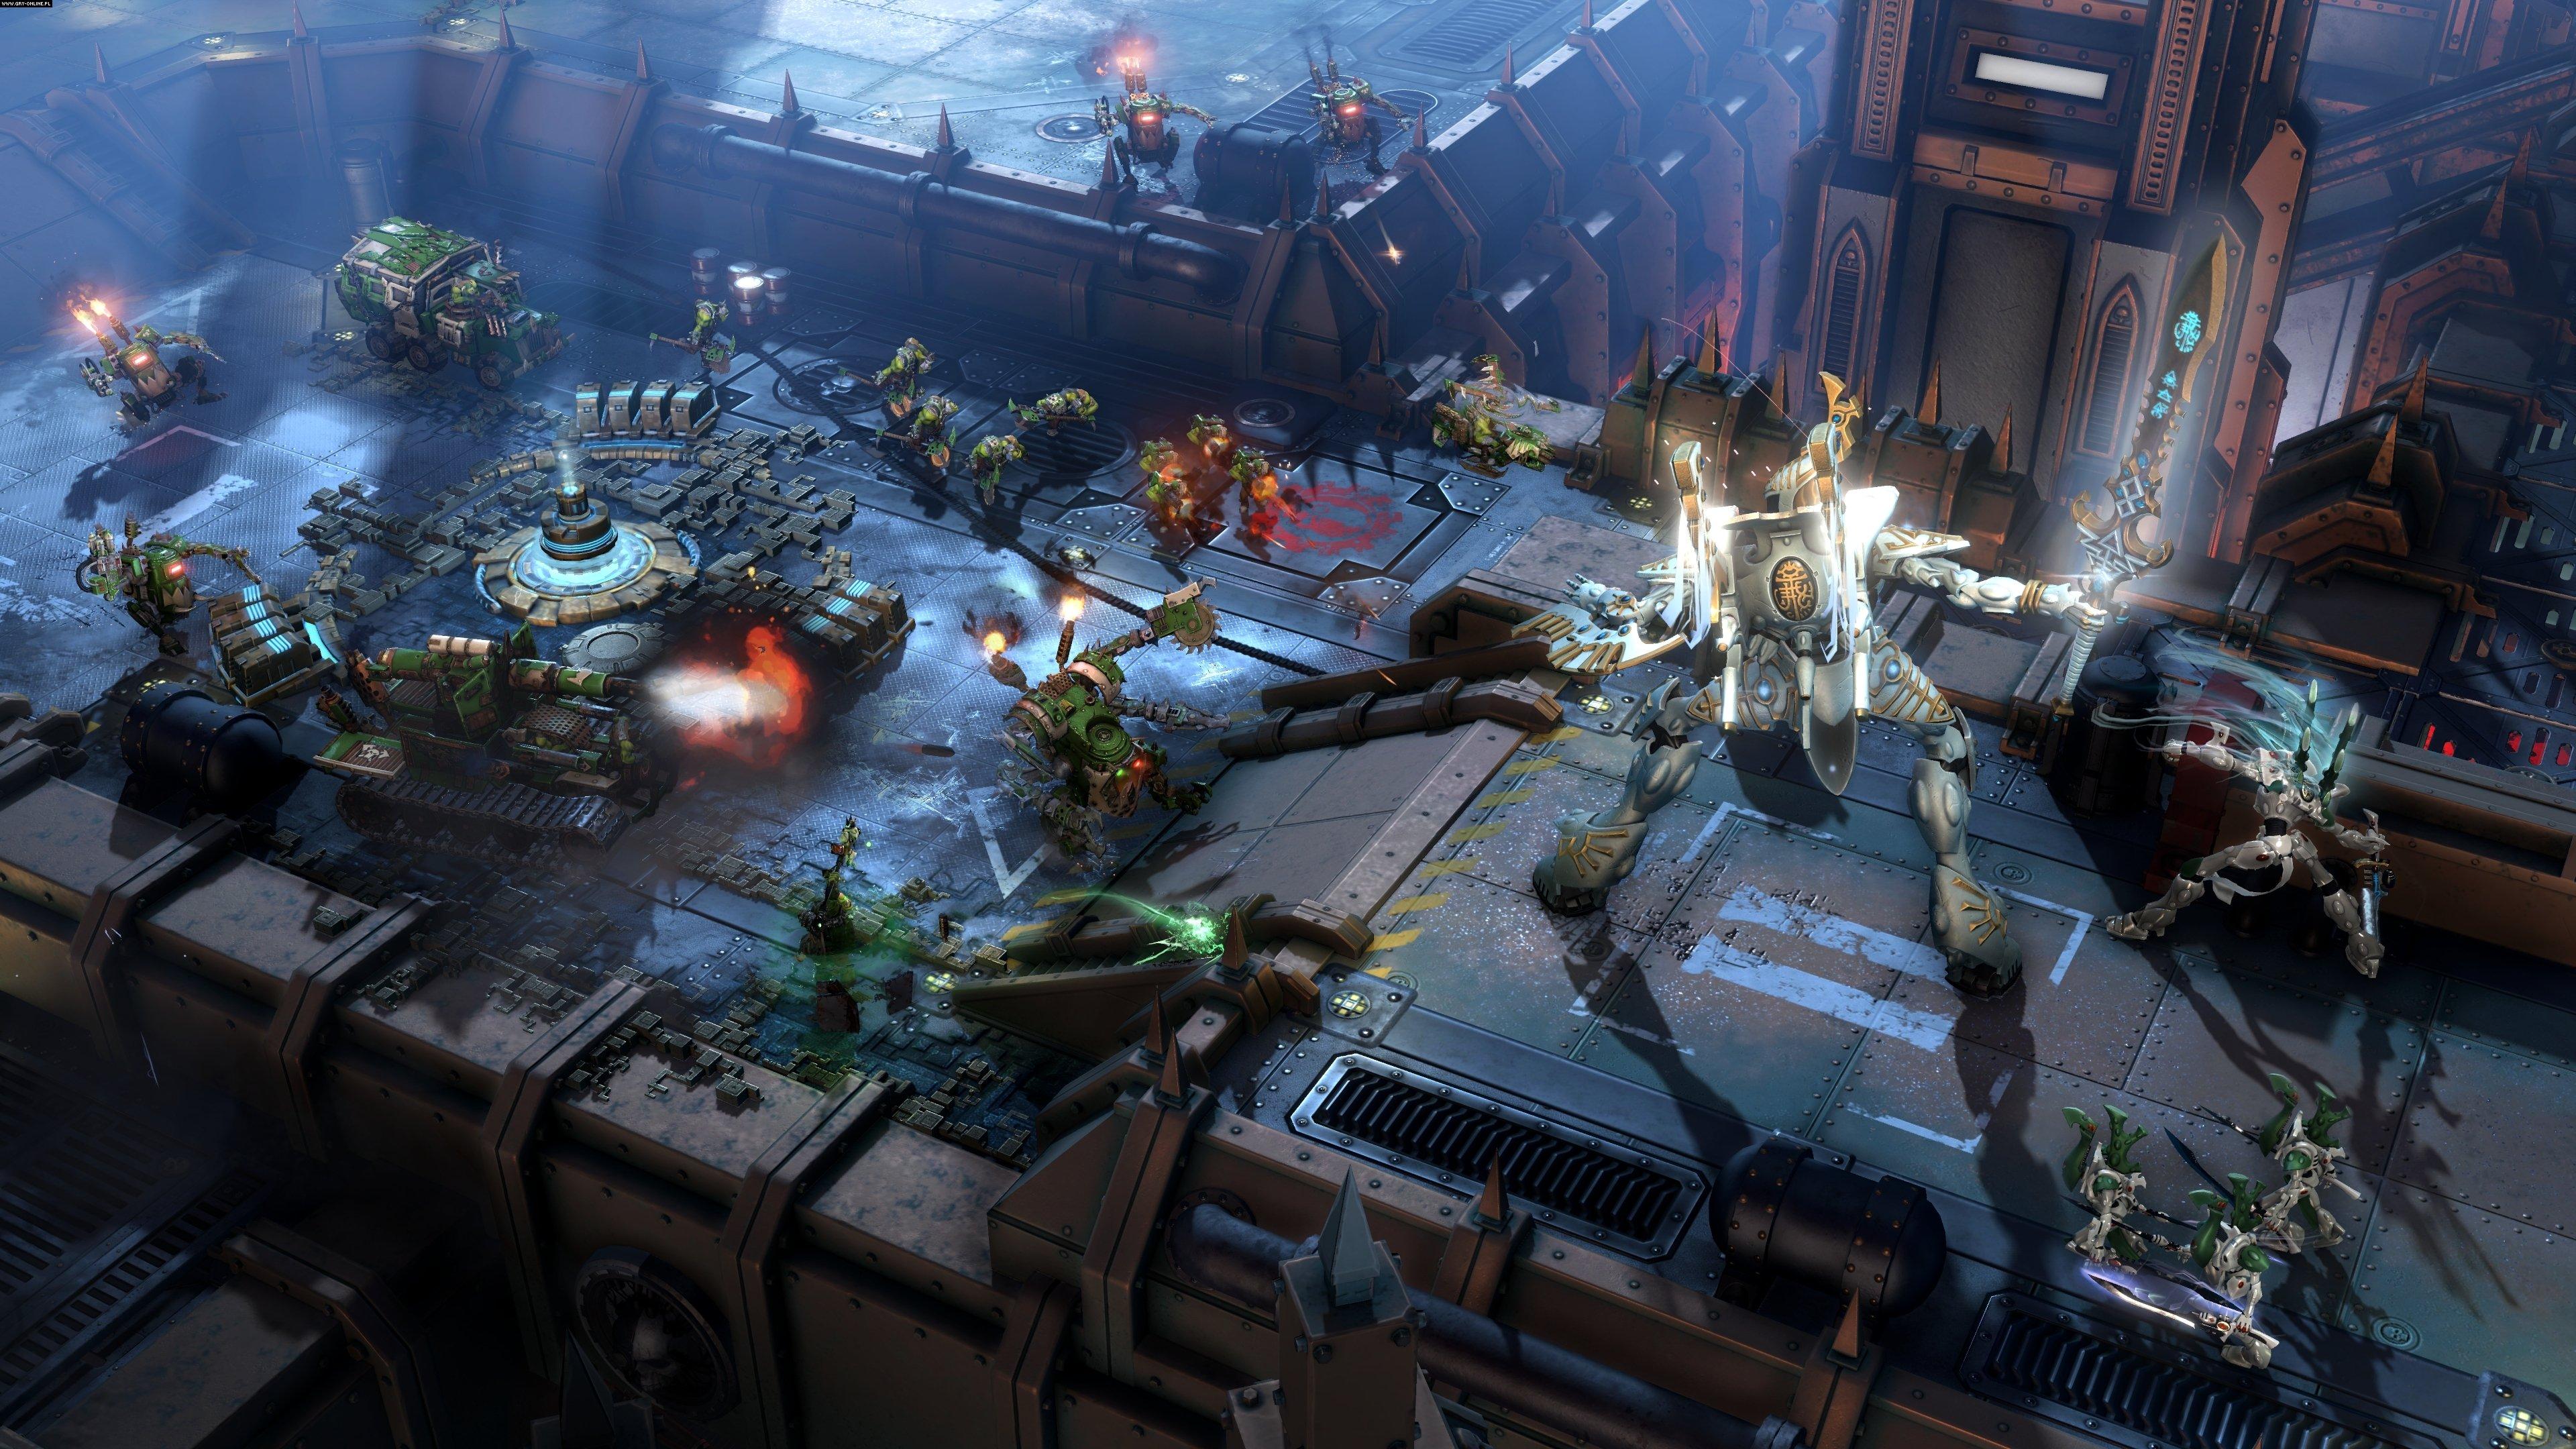 Warhammer 40,000: Dawn of War III PC Games Image 1/32, Relic Entertainment, SEGA